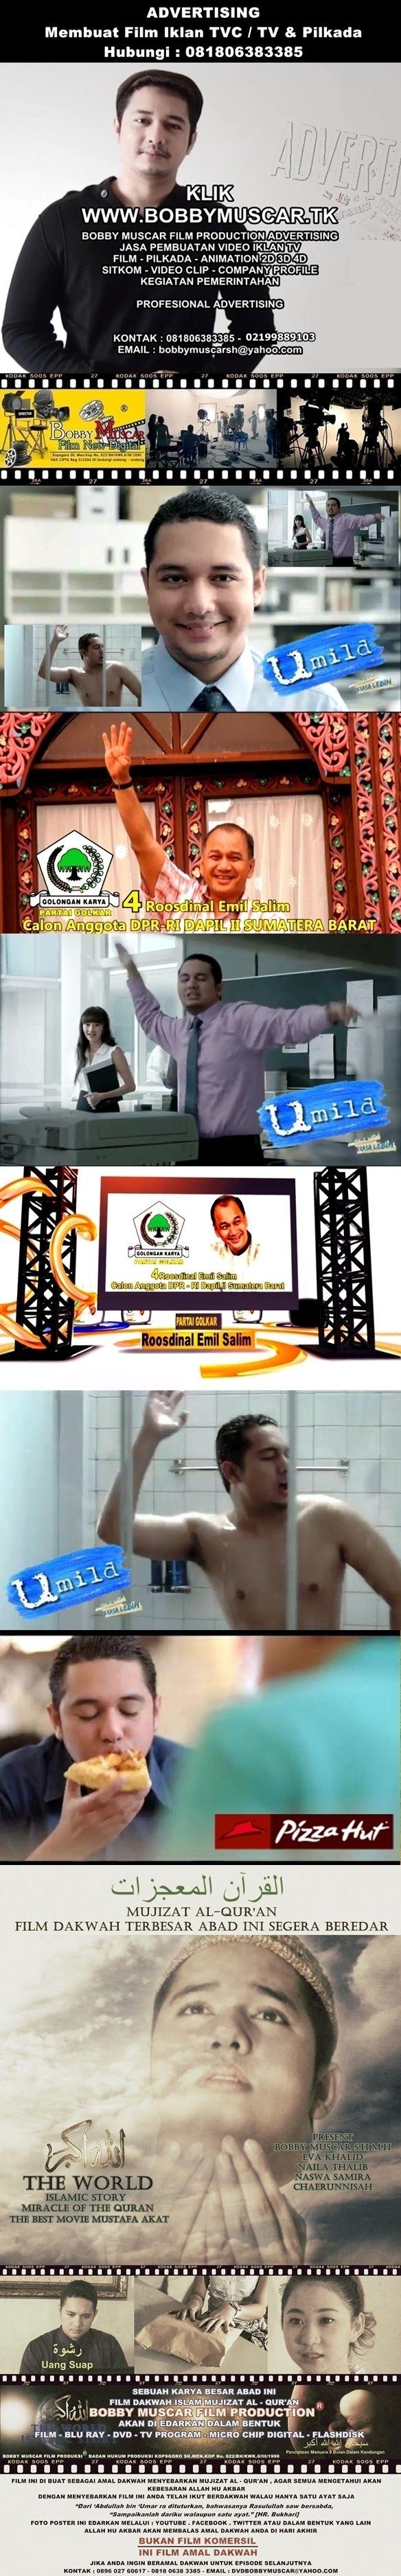 BOBBY MUSCAR FILM PRODUCTION ADVERTISING JASA PEMBUATAN FILM VIDEO IKLAN TV & PILKADA - COMPANY PROFILE.  KONTAK : 081806383385 - 02199889103 EMAIL : muscarart@yahoo.com